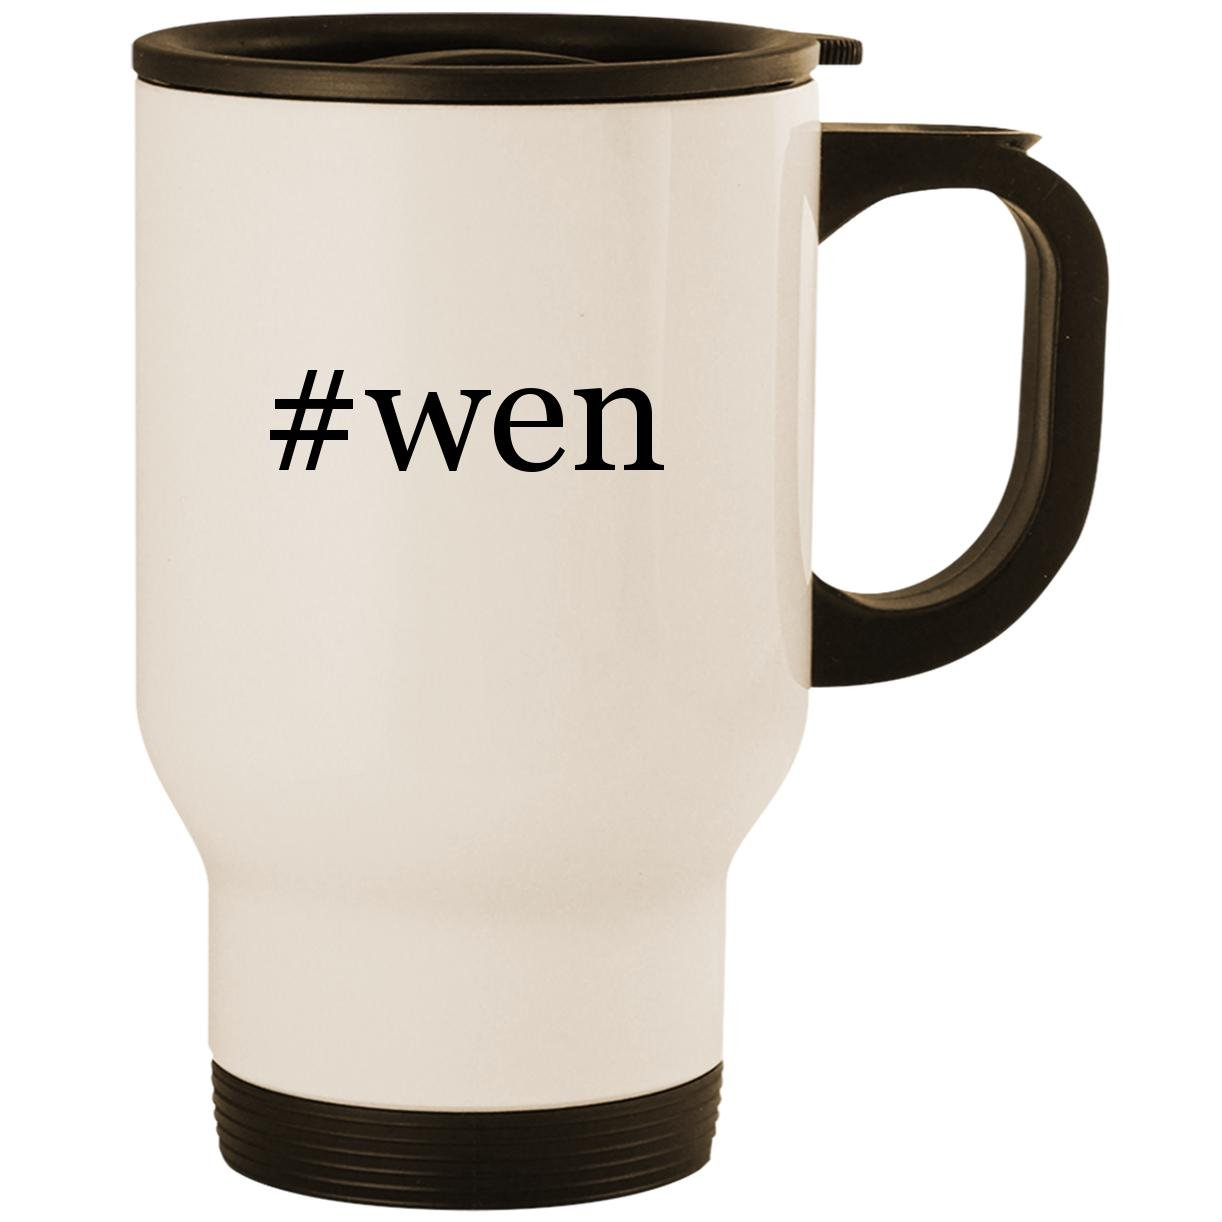 #wen - Stainless Steel 14oz Road Ready Travel Mug, White